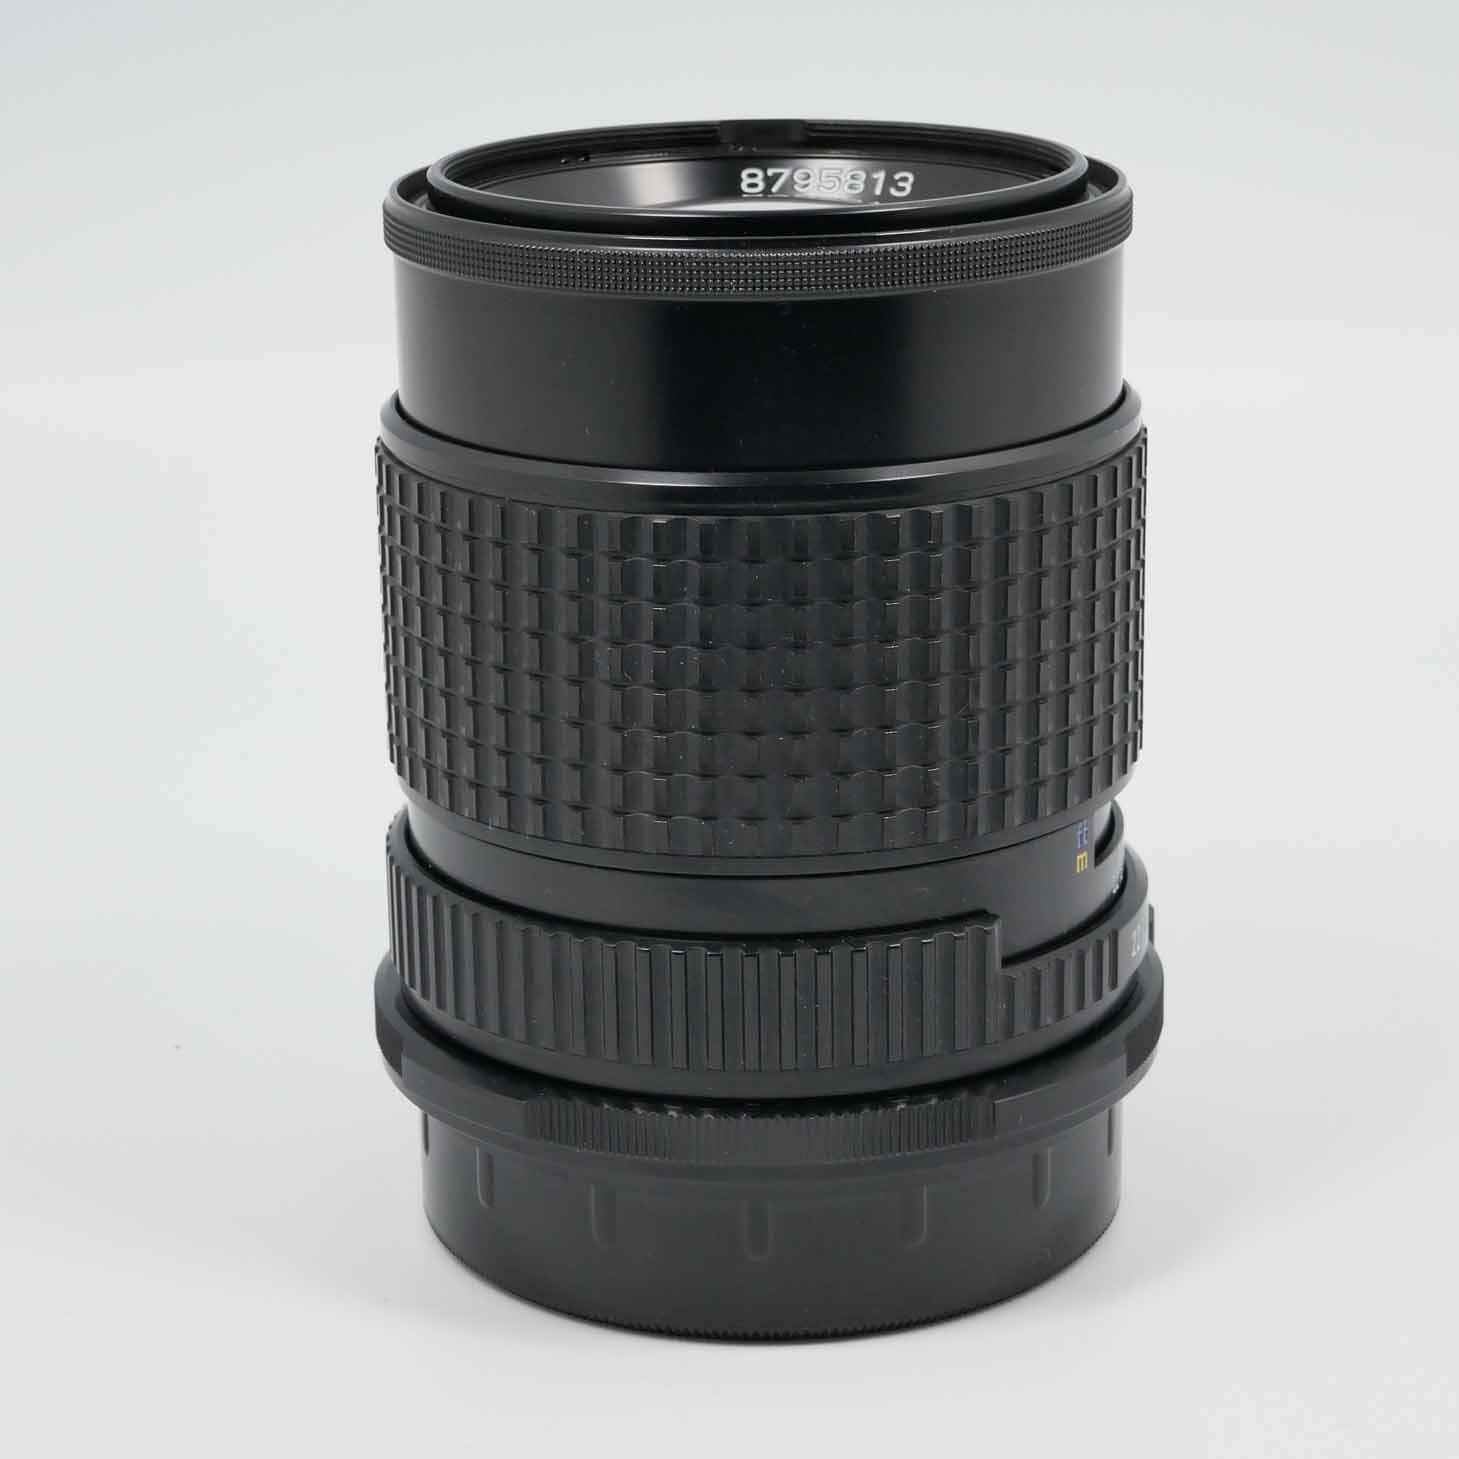 clean-cameras-Pentax-67-165mm-2.8-03